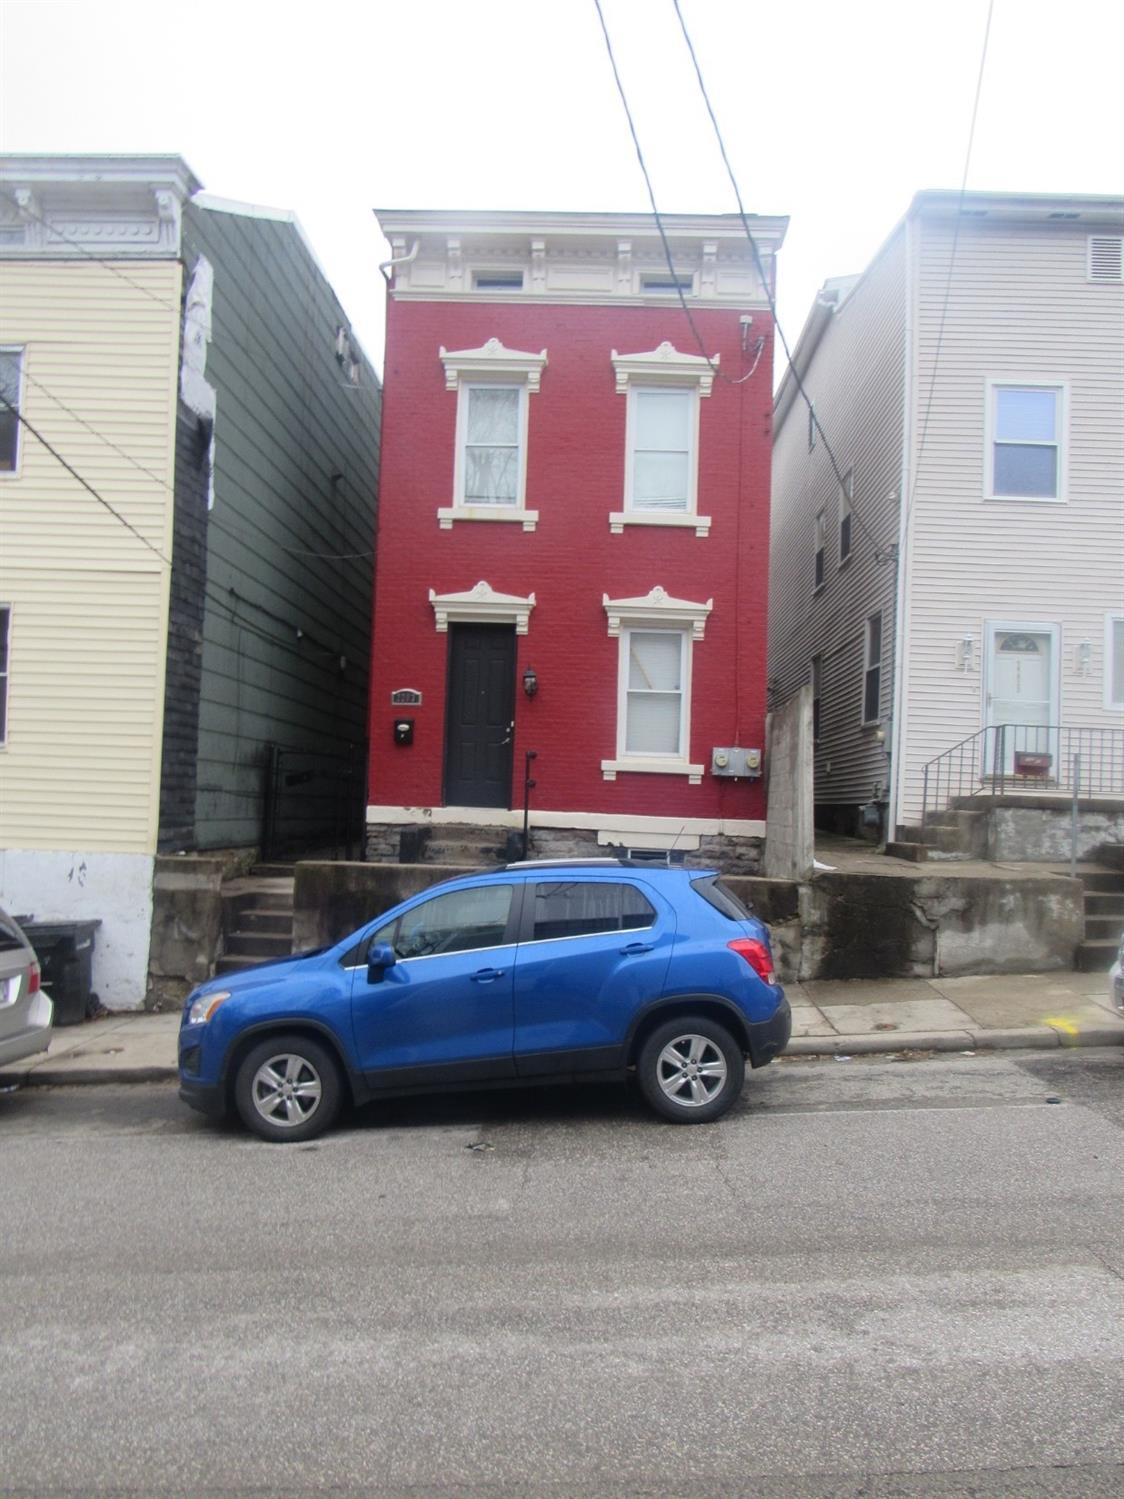 Property for sale at 2203 Rice Street, Cincinnati,  OH 45219